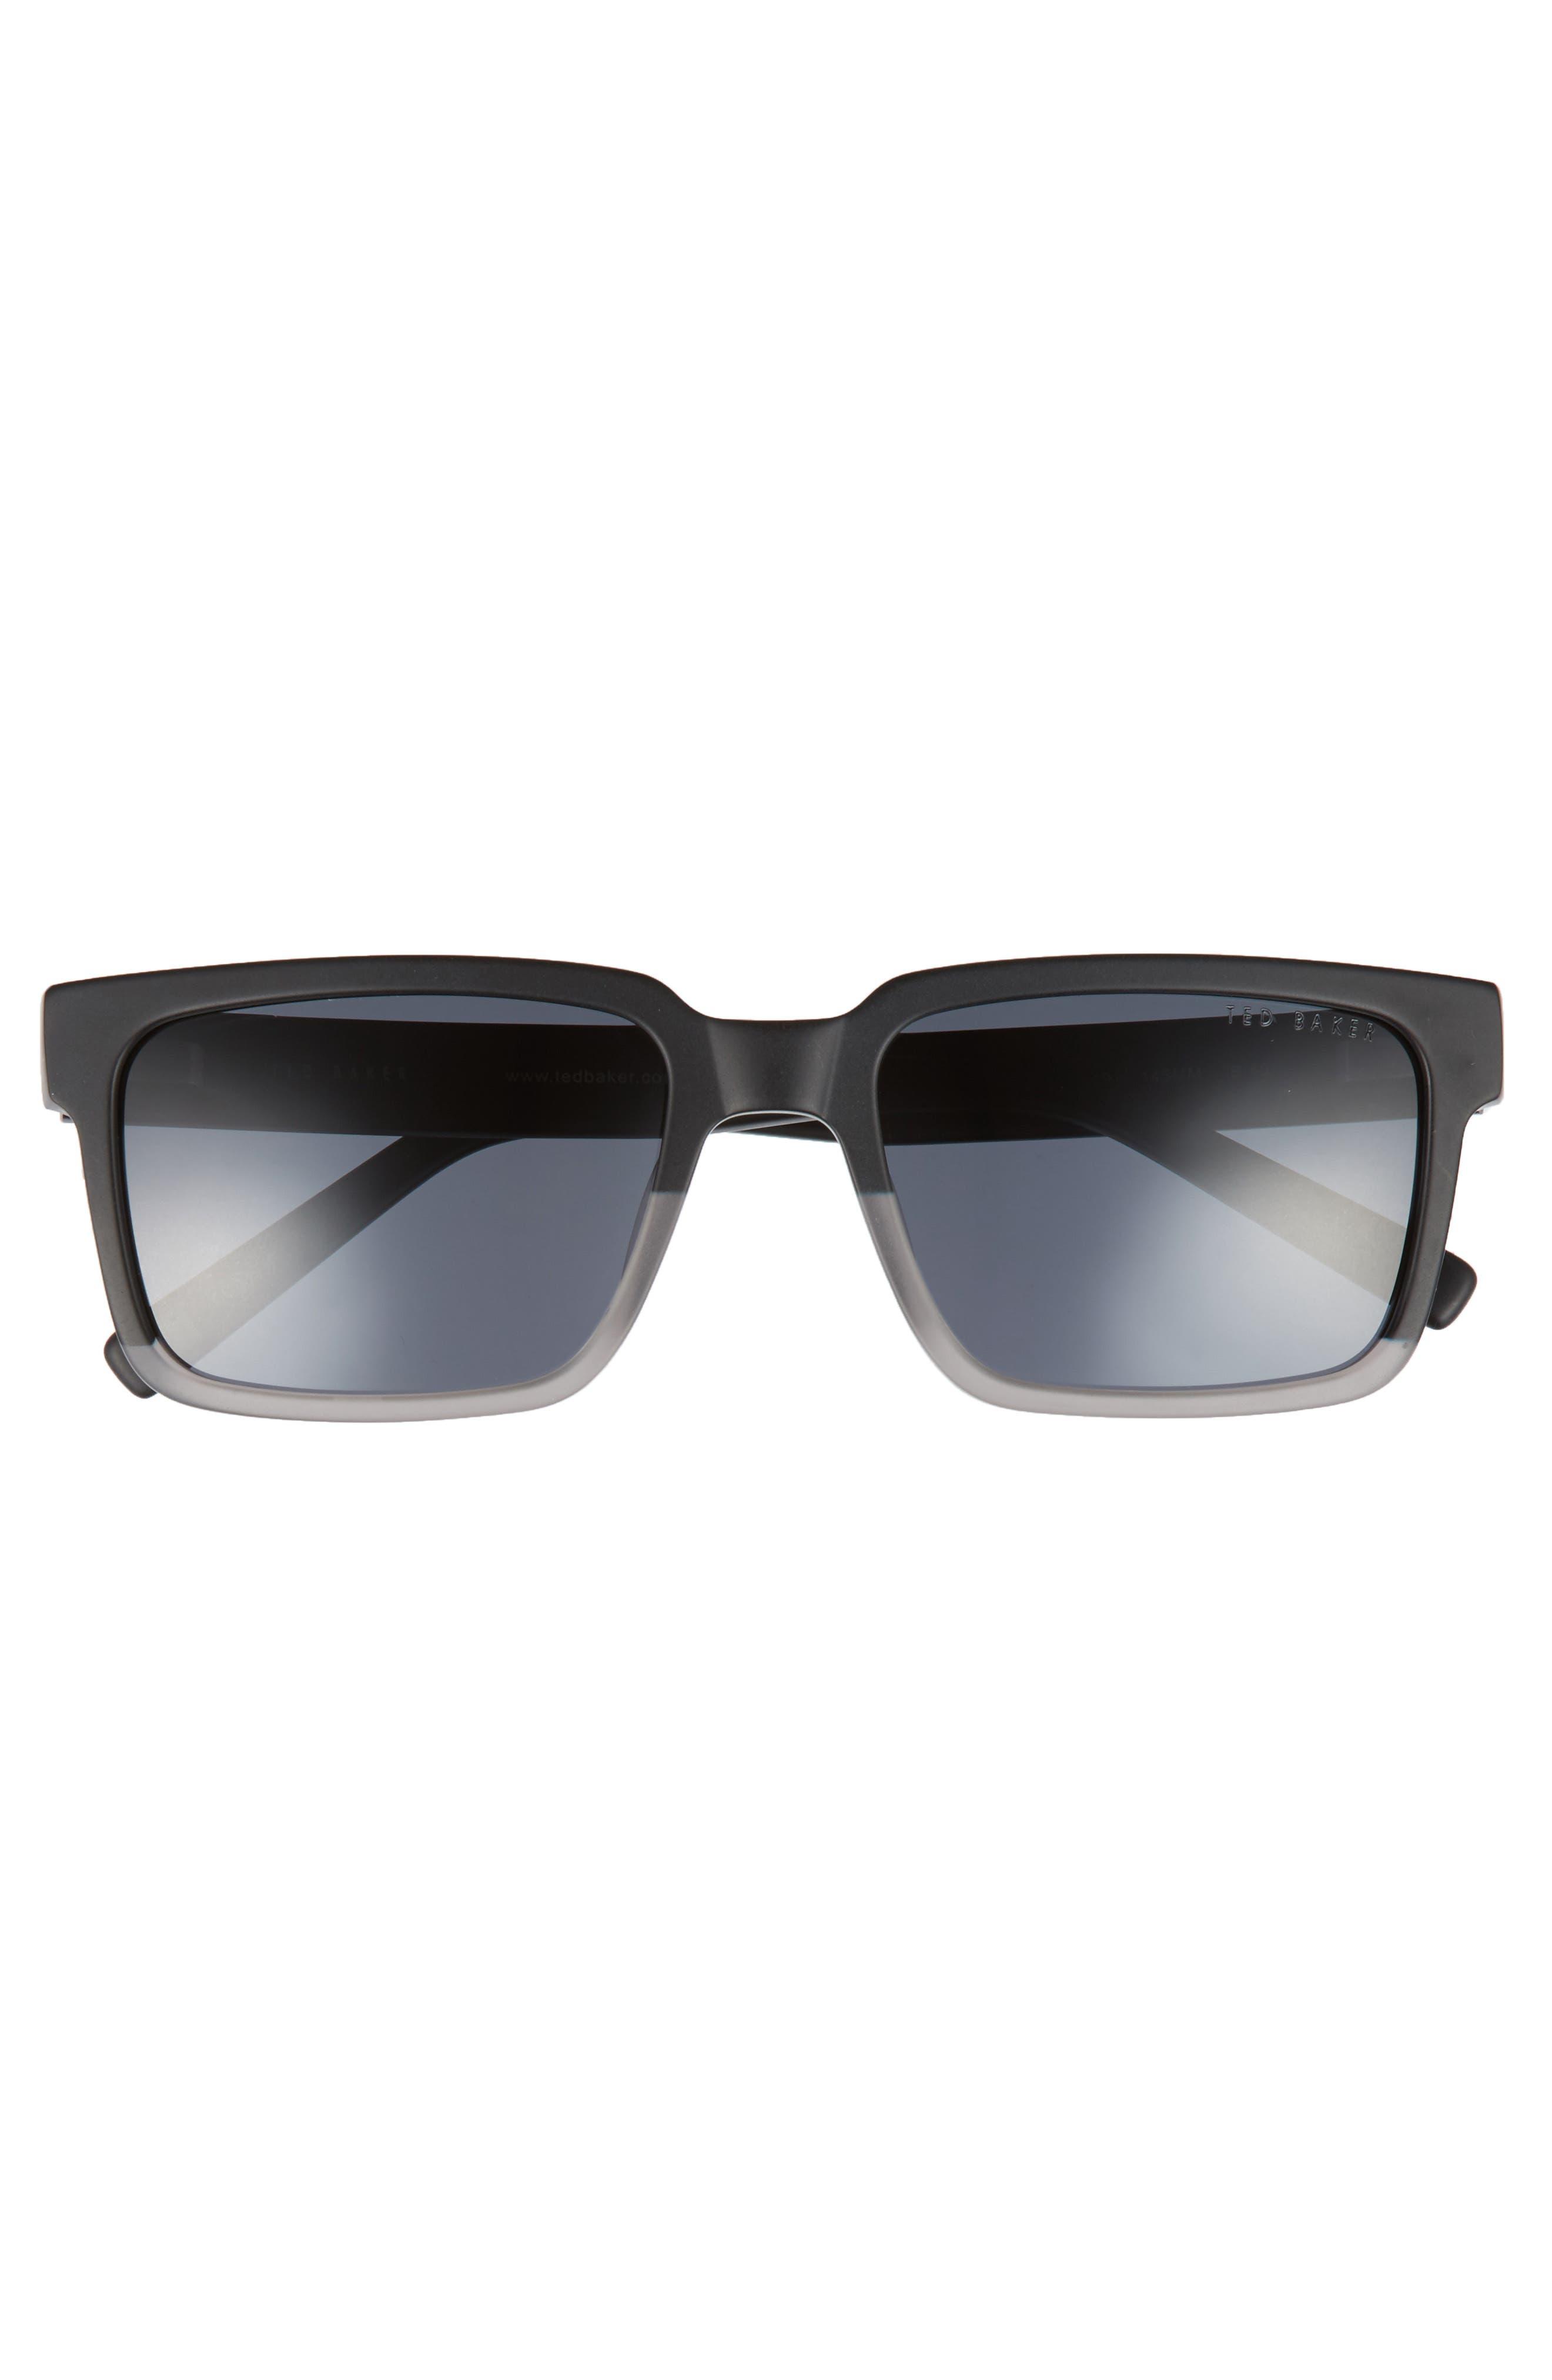 56mm Polarized Rectangular Sunglasses,                             Alternate thumbnail 2, color,                             001